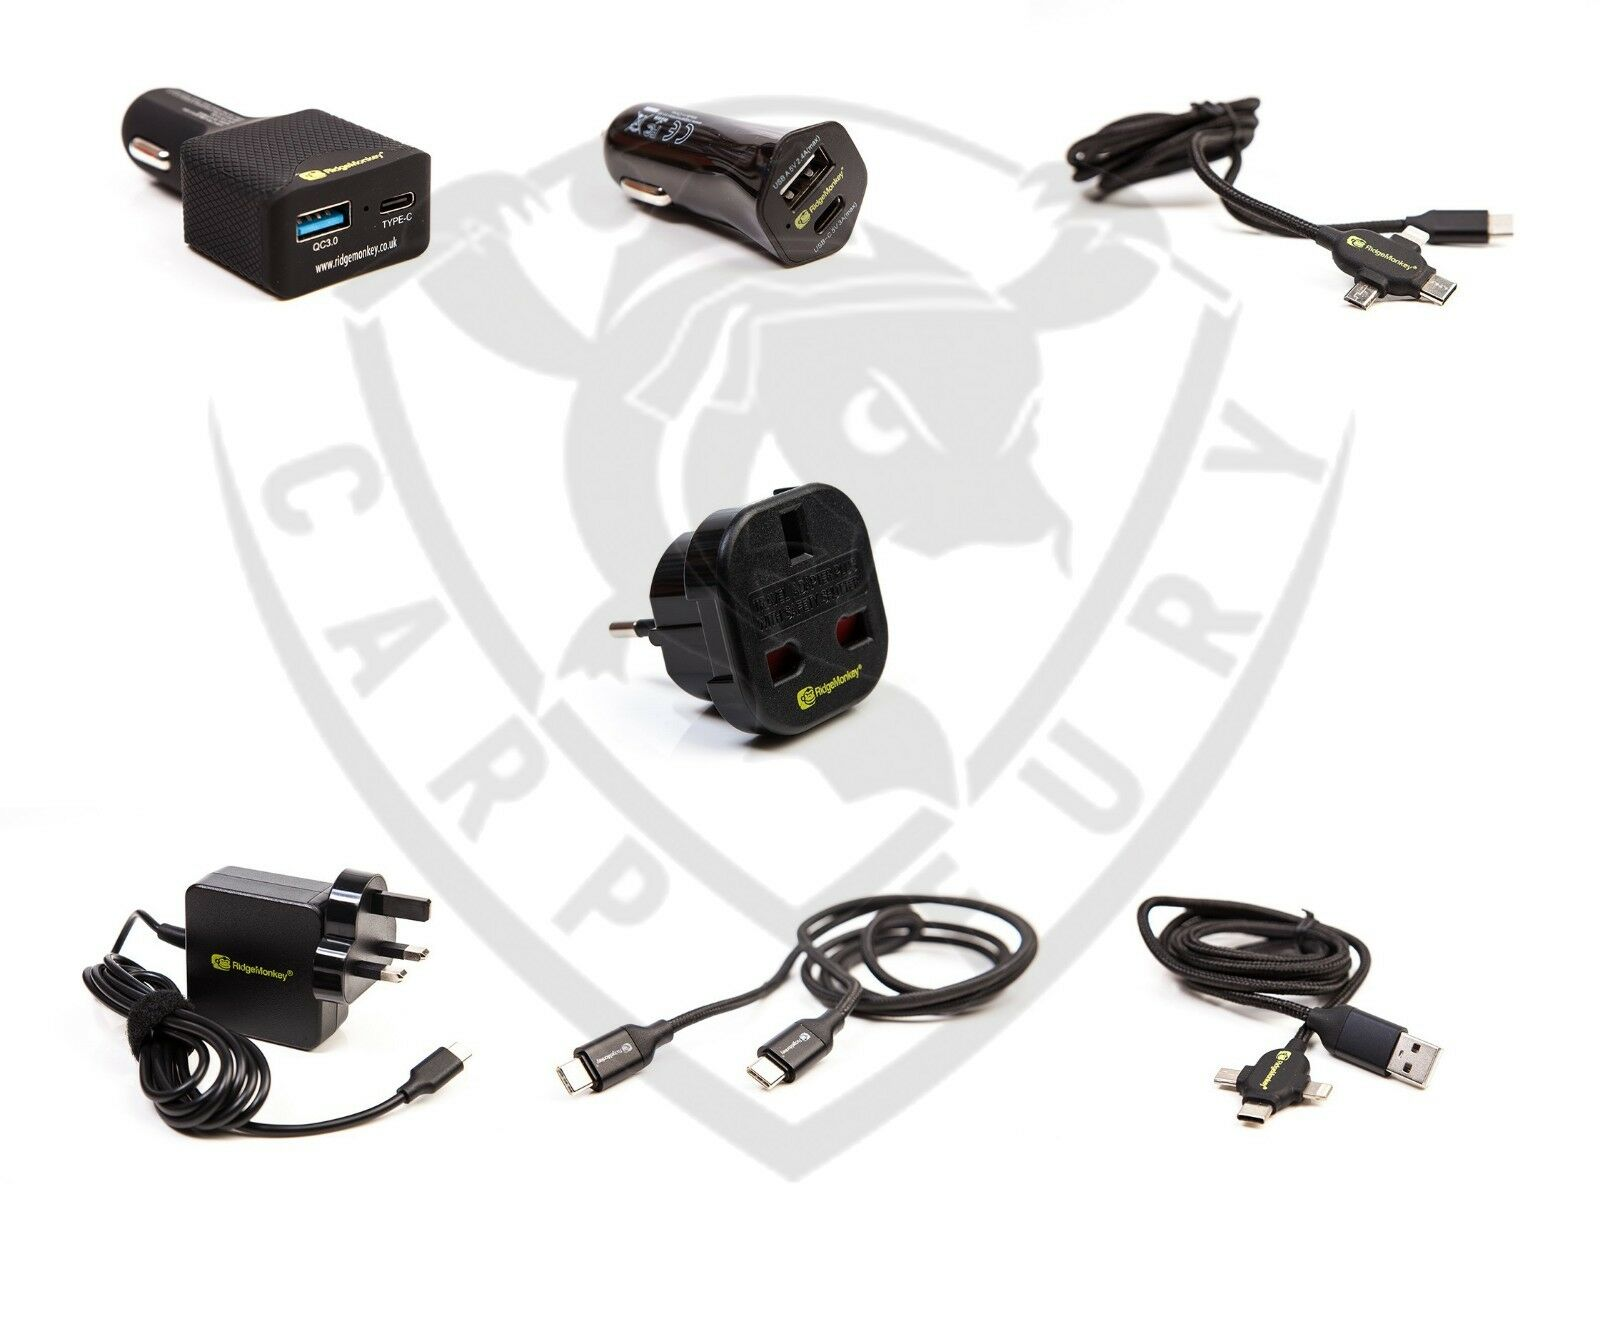 New Ridgemonkey Ridge Monkey Vault USB-C USB-A  Multi Out Cable Charger Adaptor  large discount